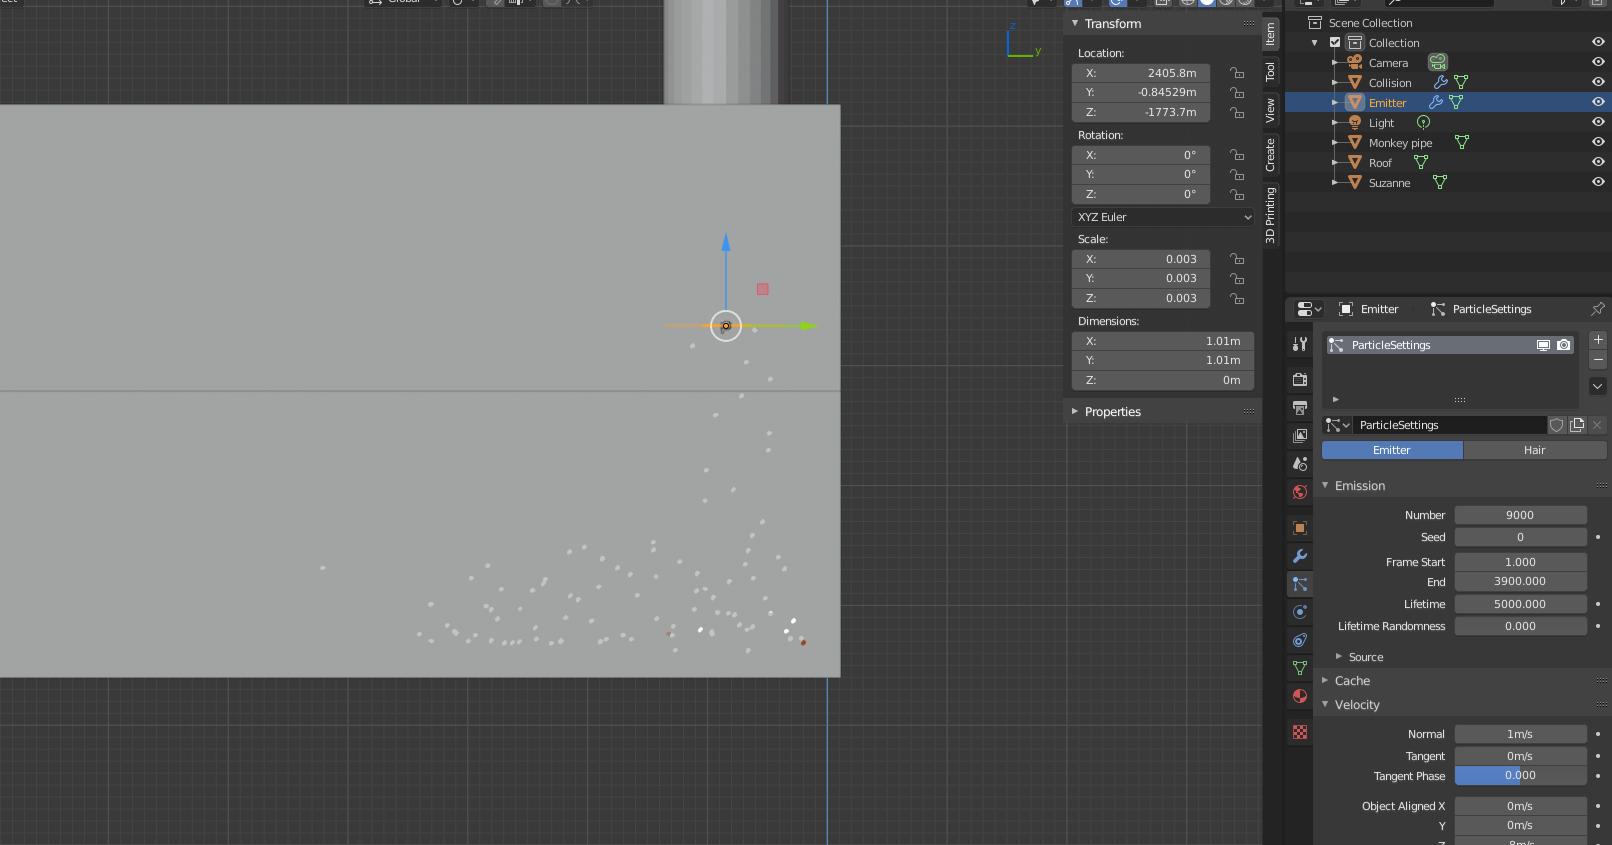 Blender 2 80 Beta May 27 build Collision help(edited) - CG